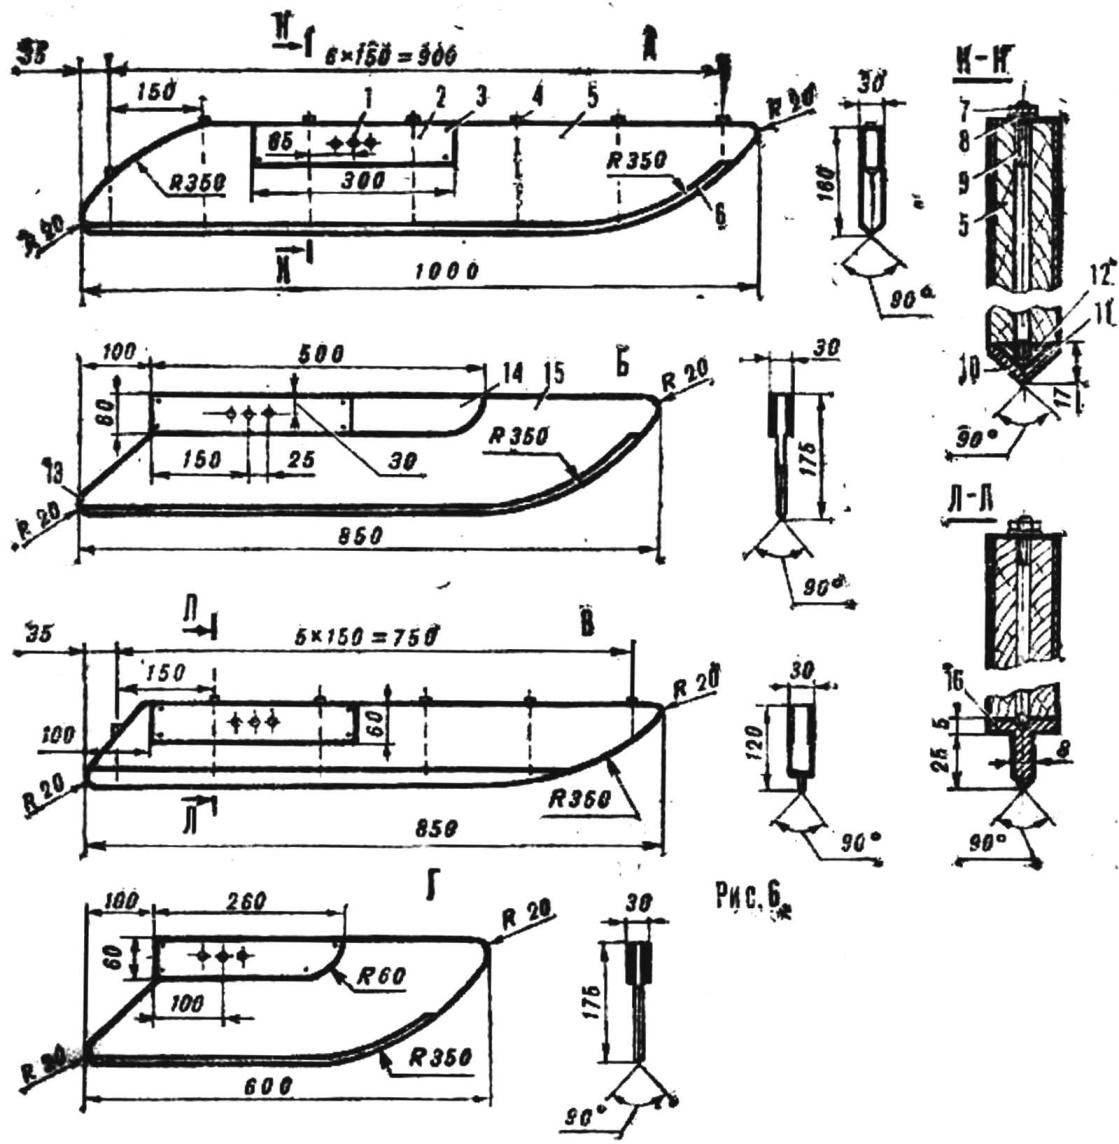 Fig. 6. Skates ice boats